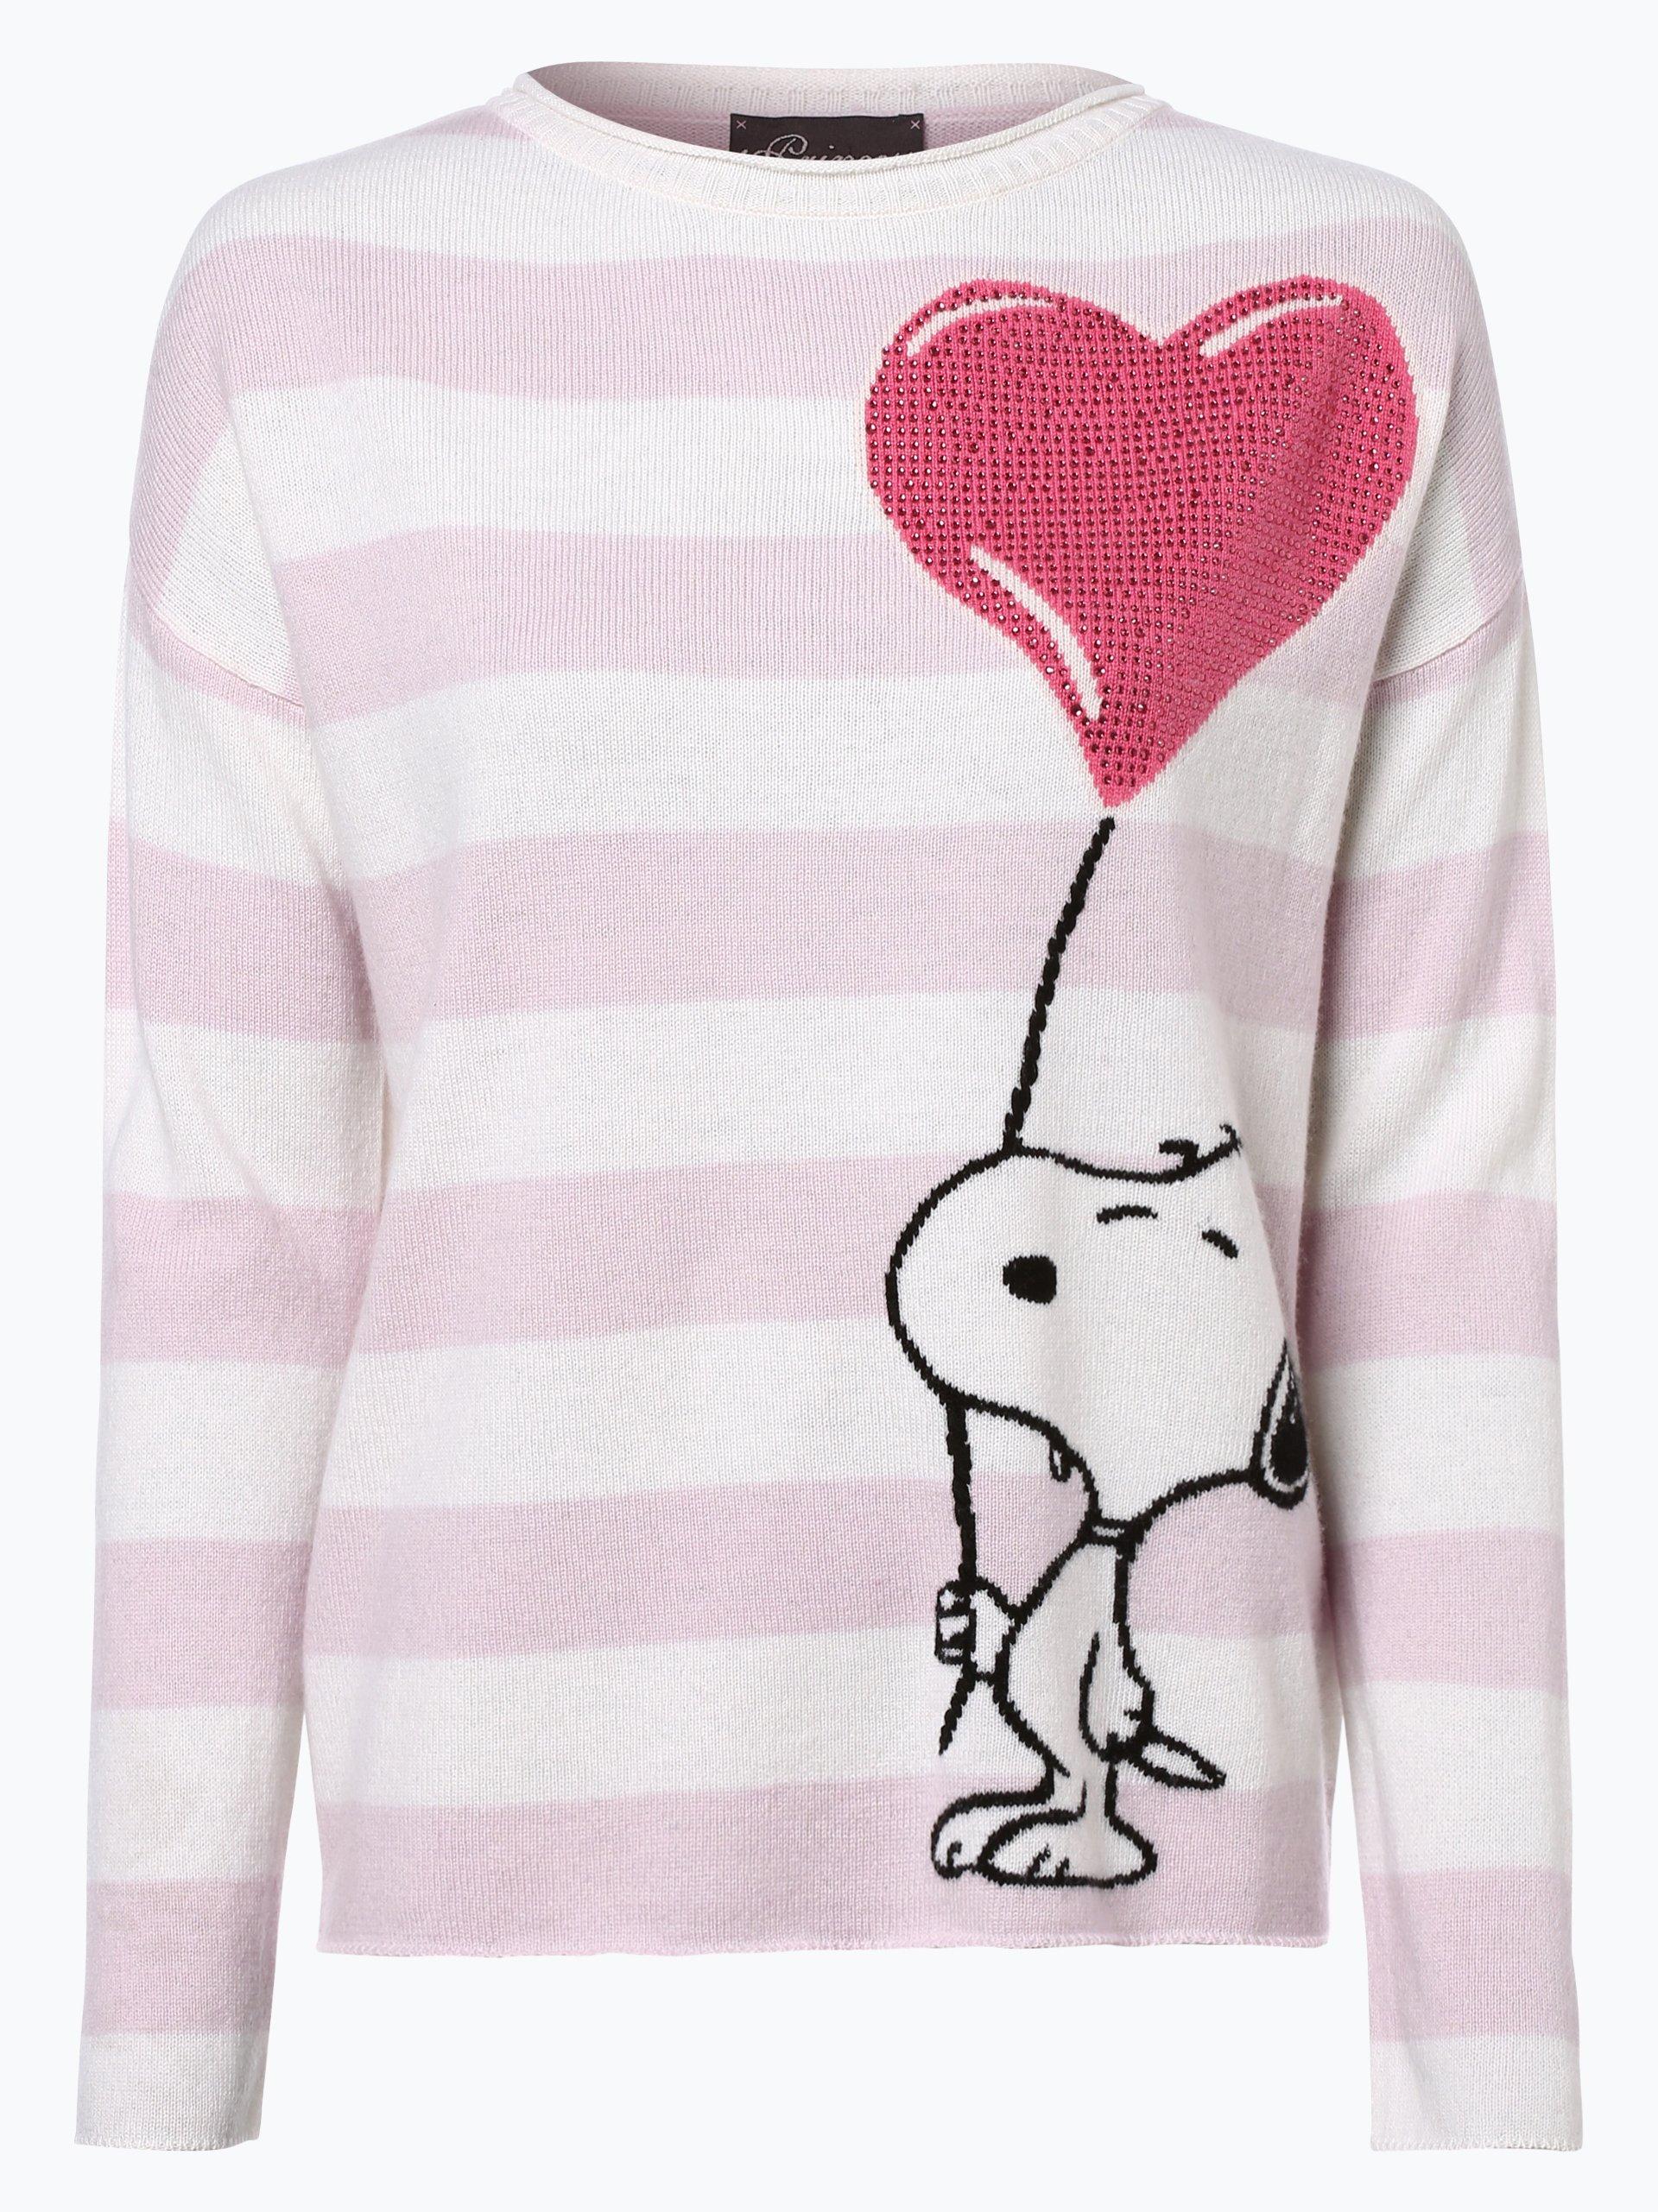 princess goes hollywood damen pullover mit cashmere anteil rosa gestreift online kaufen. Black Bedroom Furniture Sets. Home Design Ideas